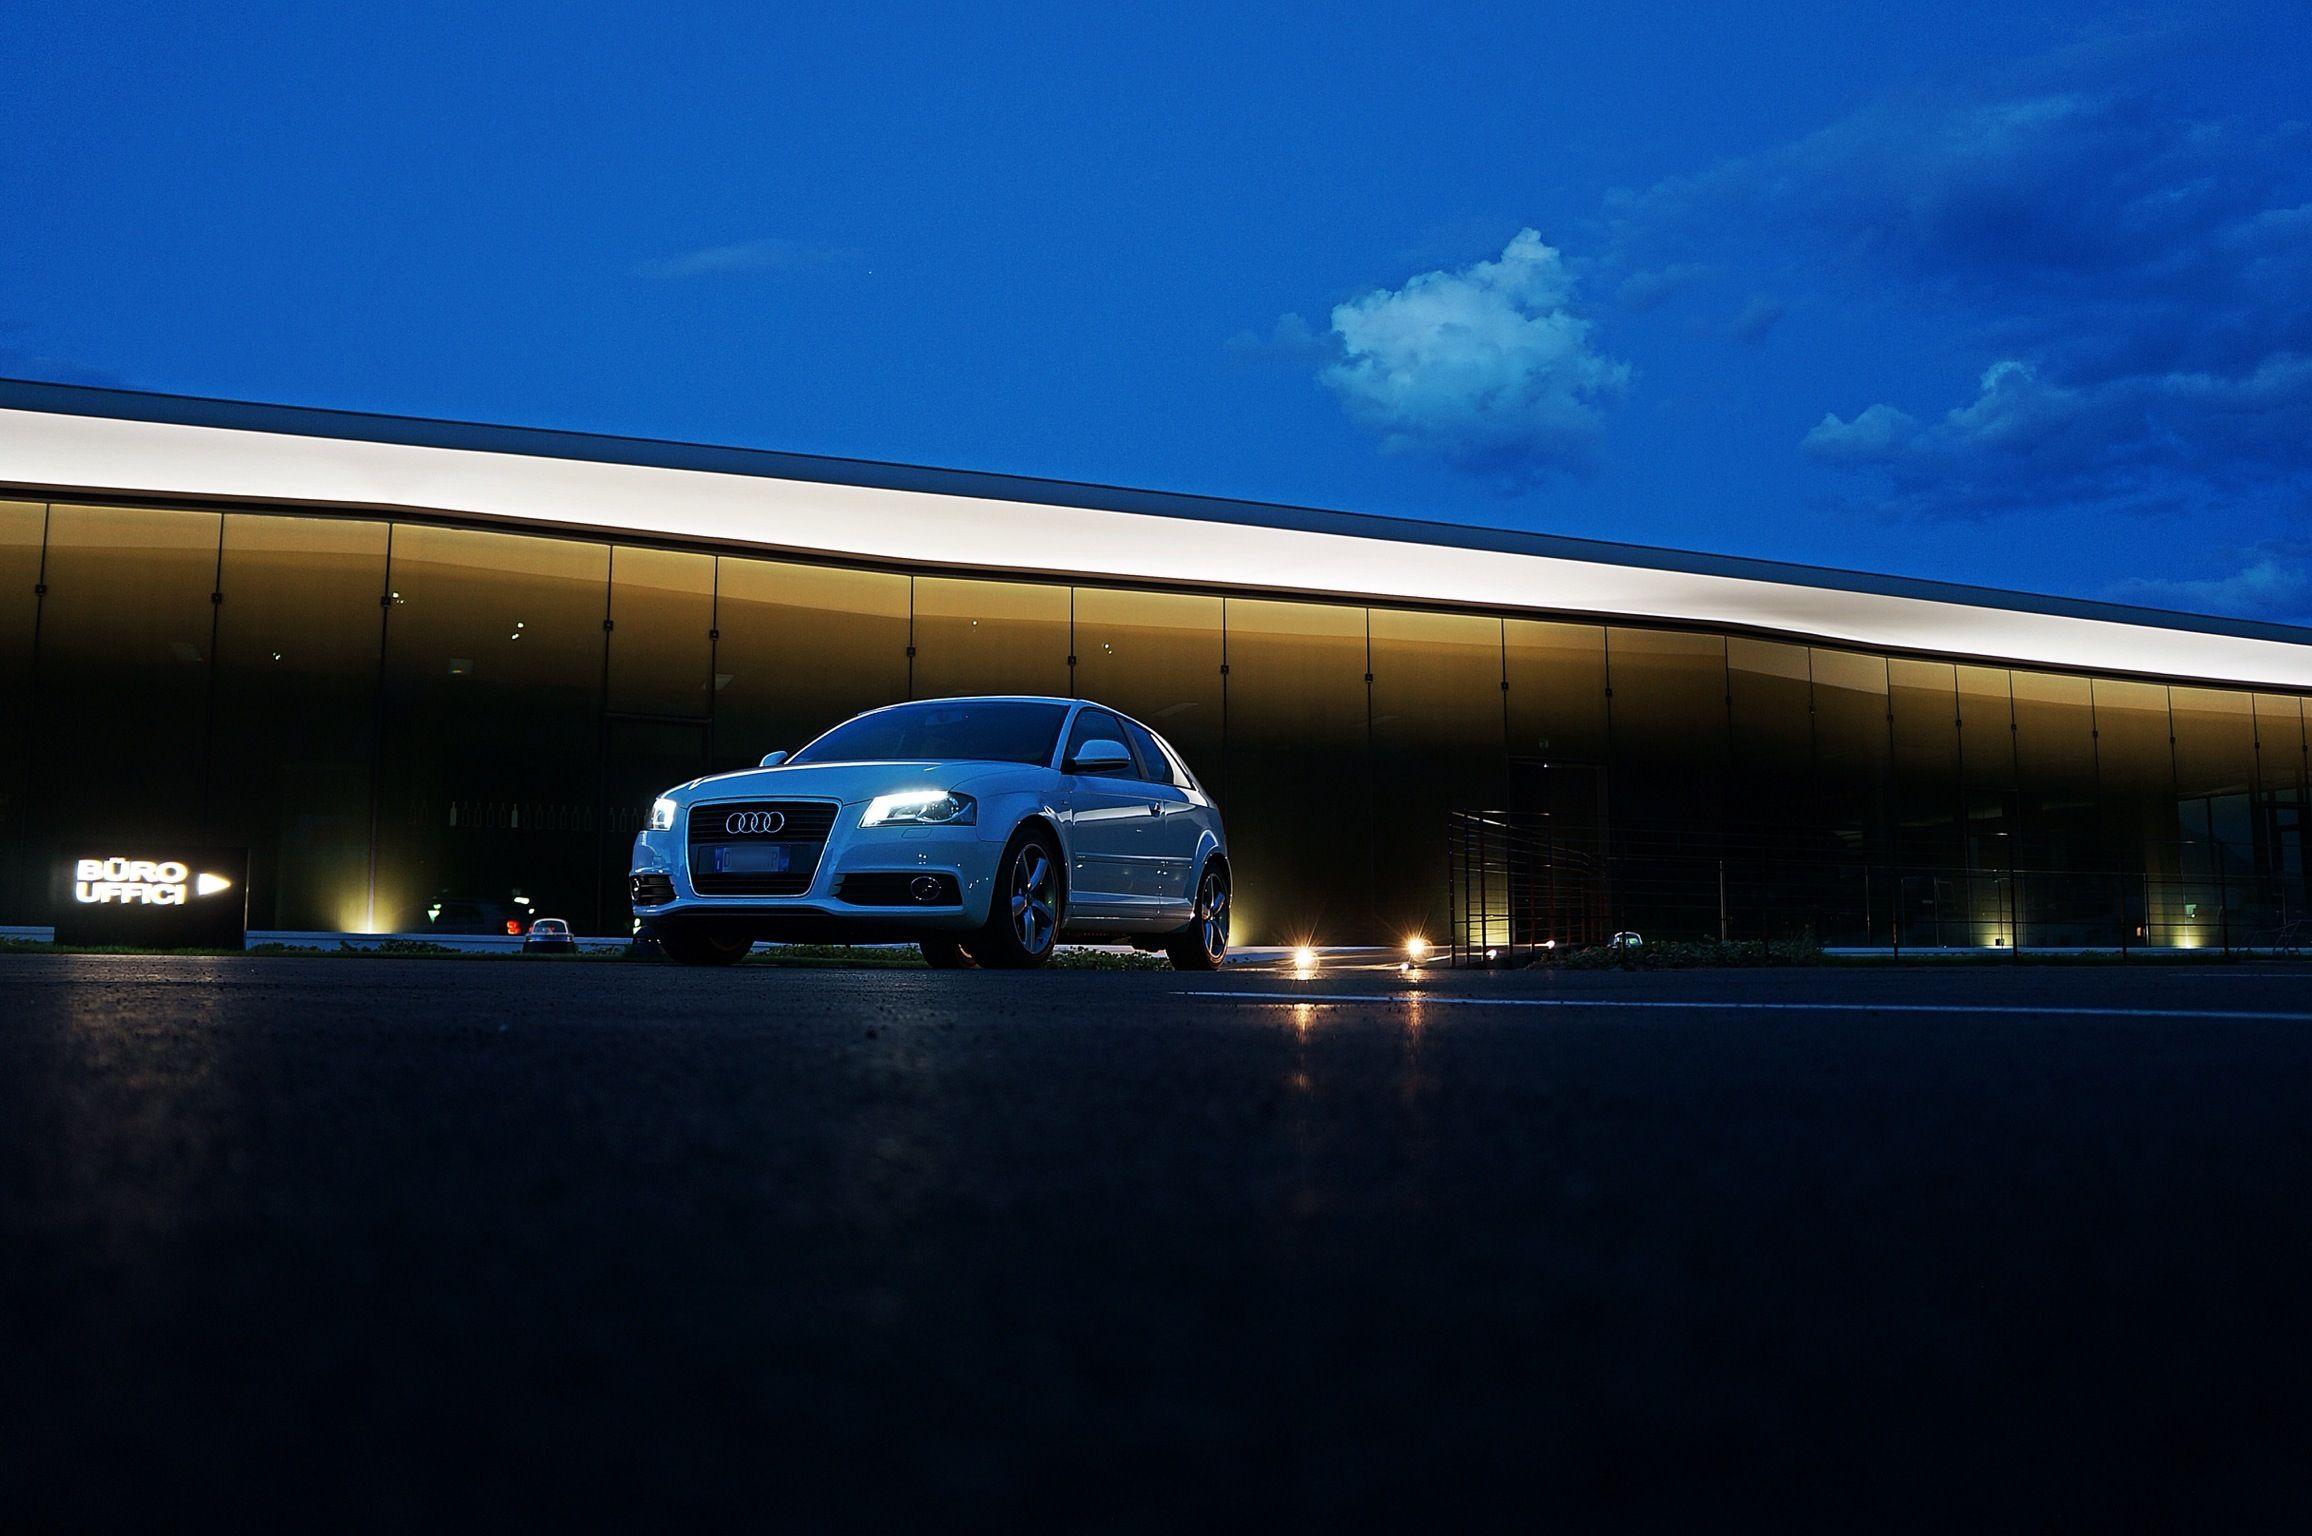 Audi A3 in the night